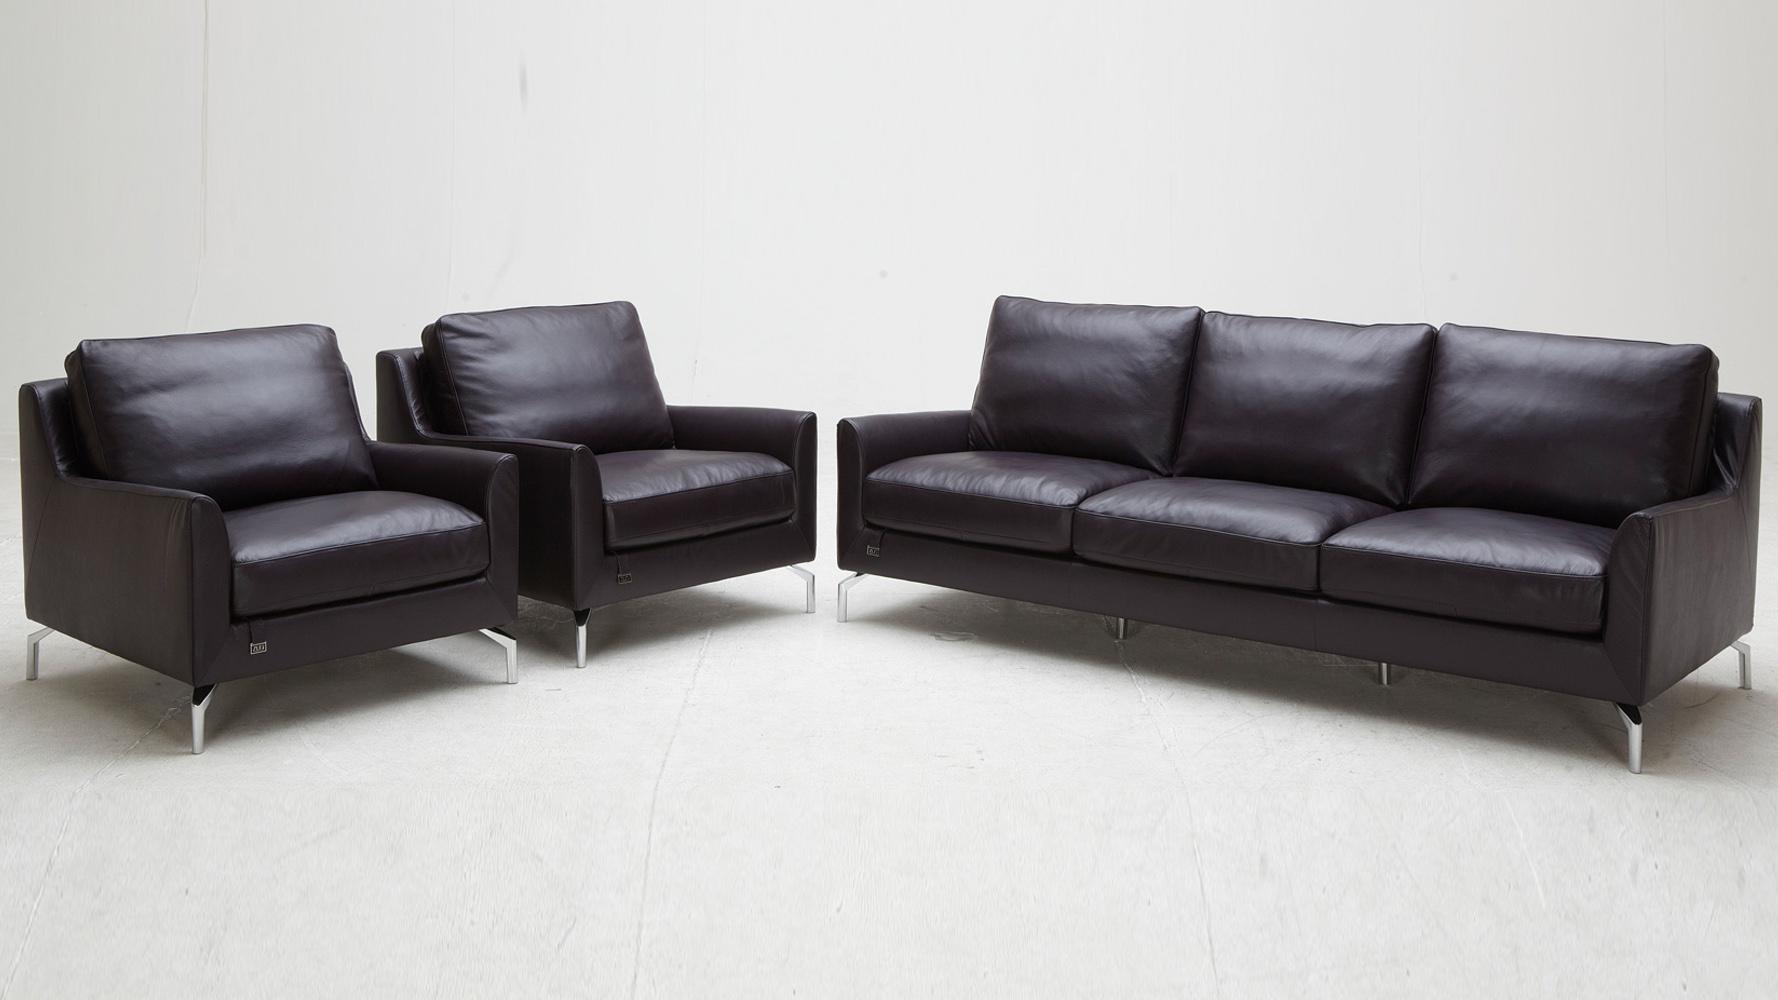 Purple Saxon Leather Sofa Set With Two Chairs | Zuri Furniture